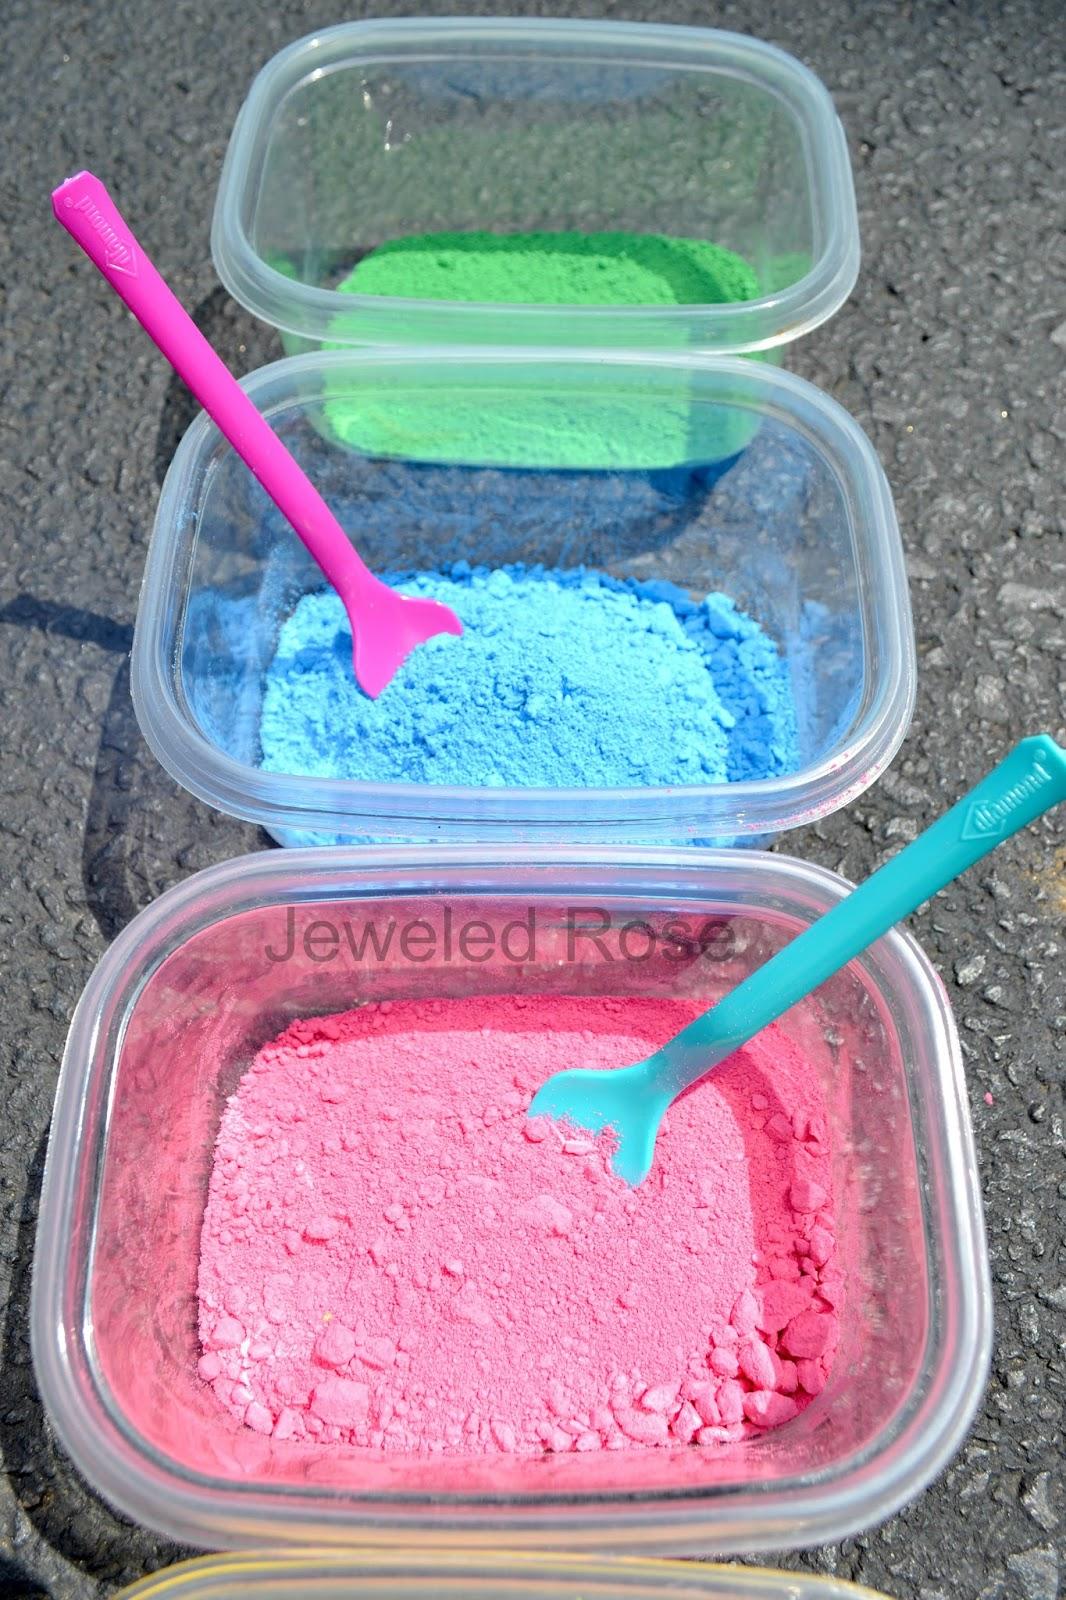 homemade powder paint recipe growing a jeweled rose bloglovin